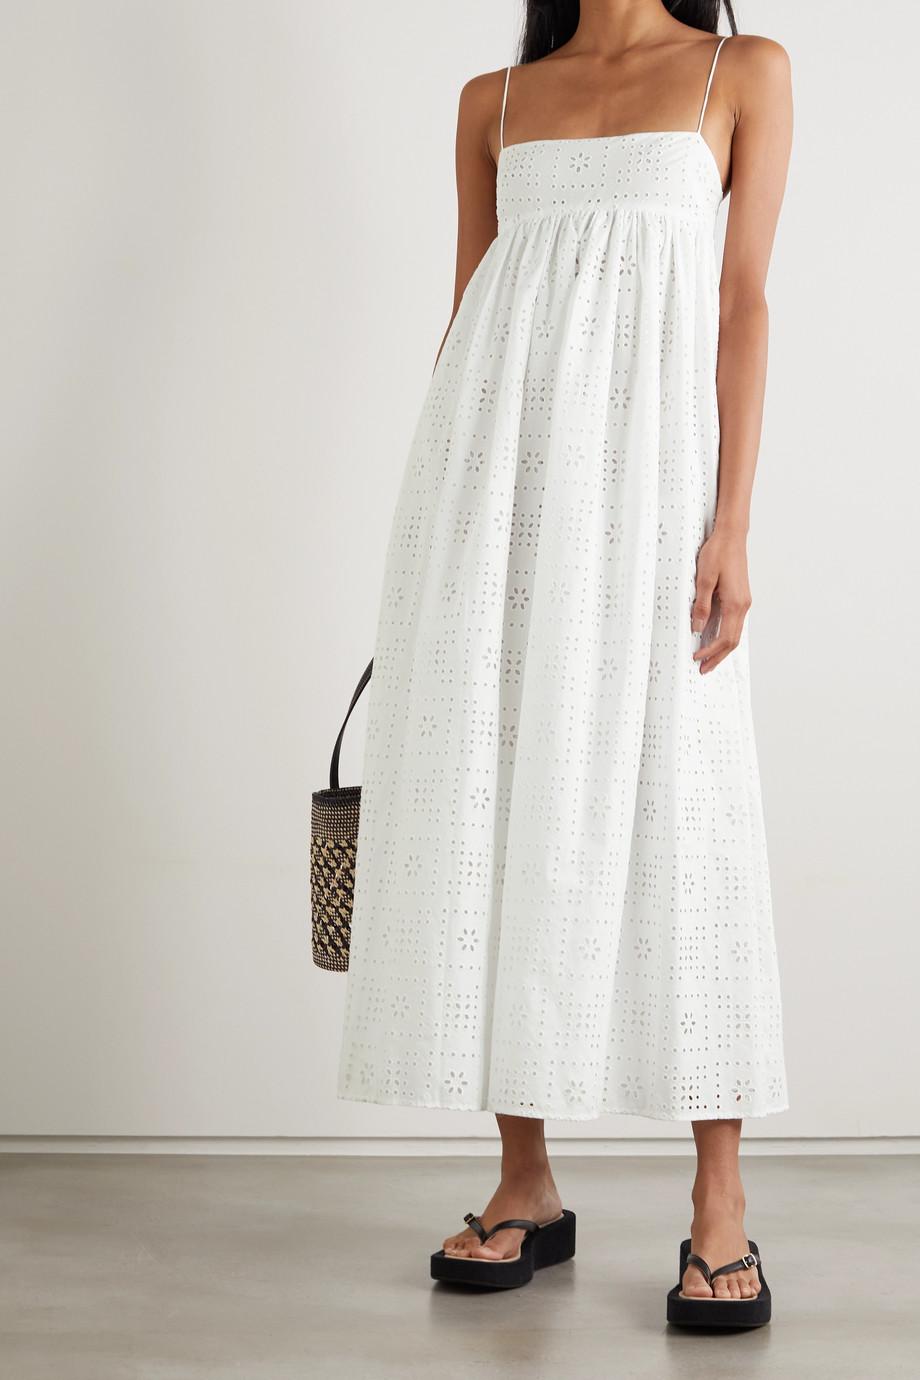 Matteau + NET SUSTAIN broderie anglaise organic cotton-poplin dress